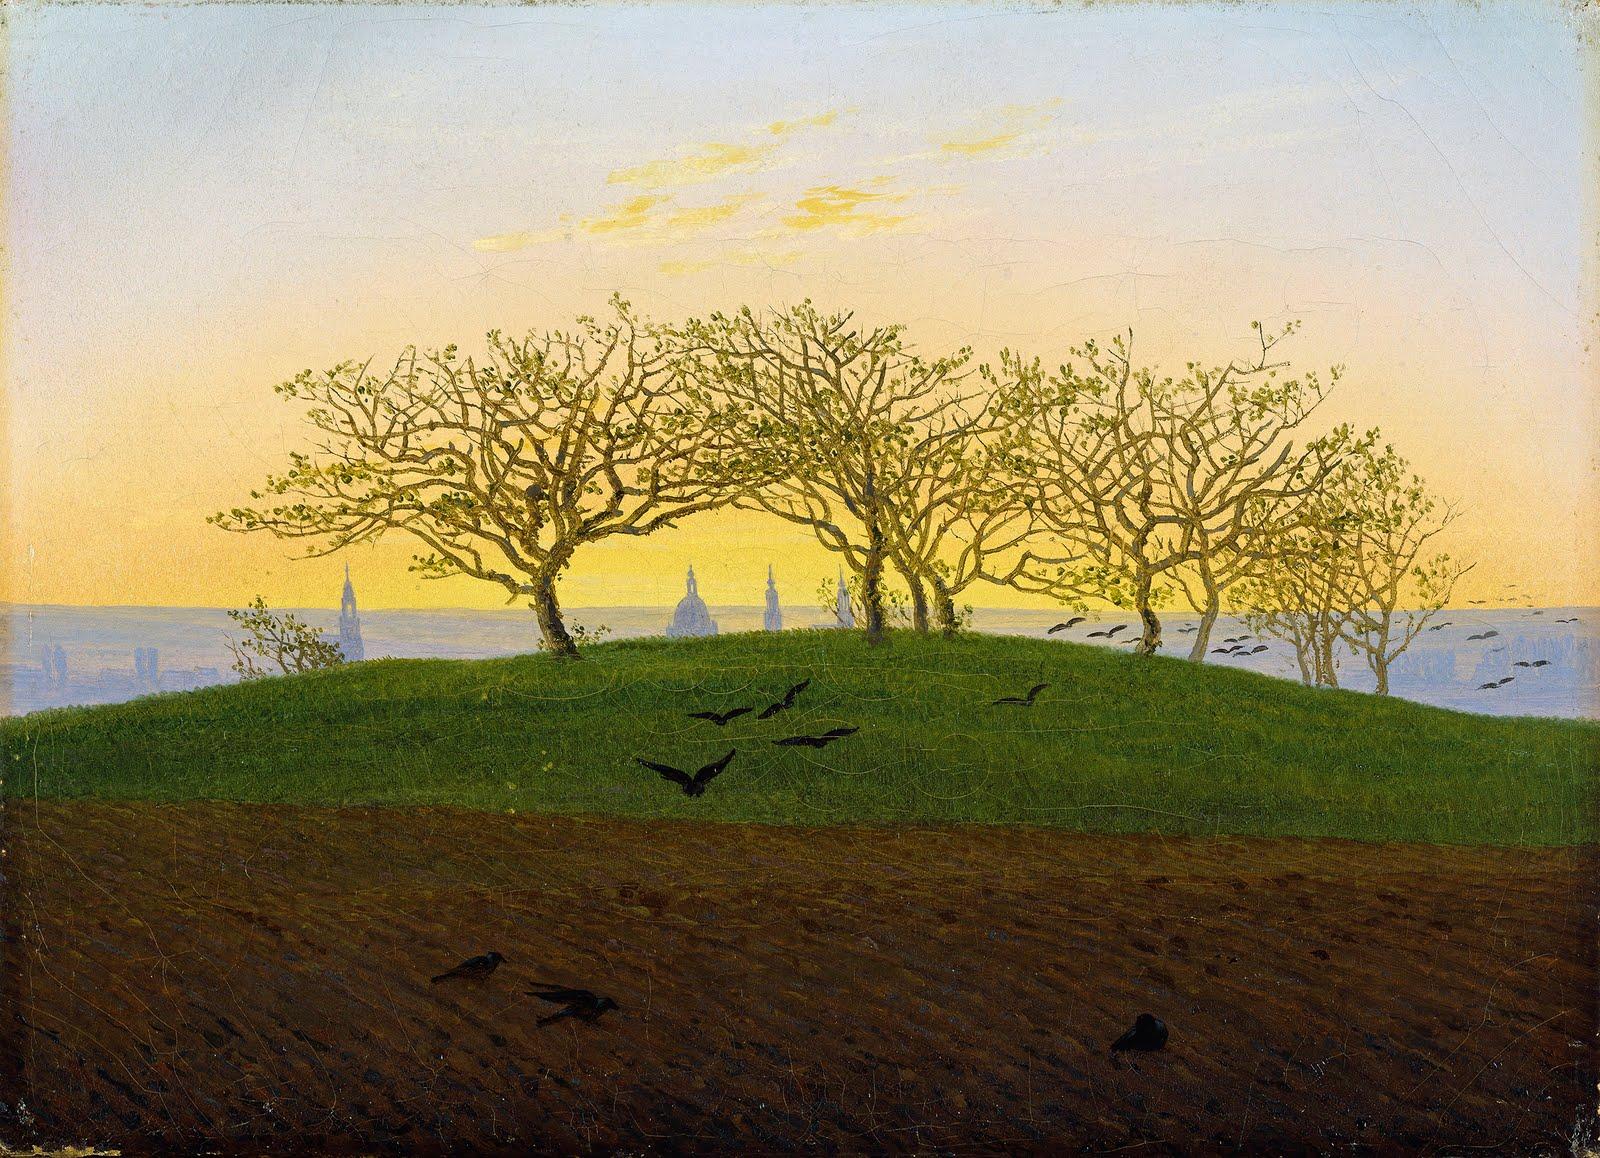 1824 Hill_and_Ploughed_Field_near_Dresden_by_Caspar_David_Friedrich.jpg